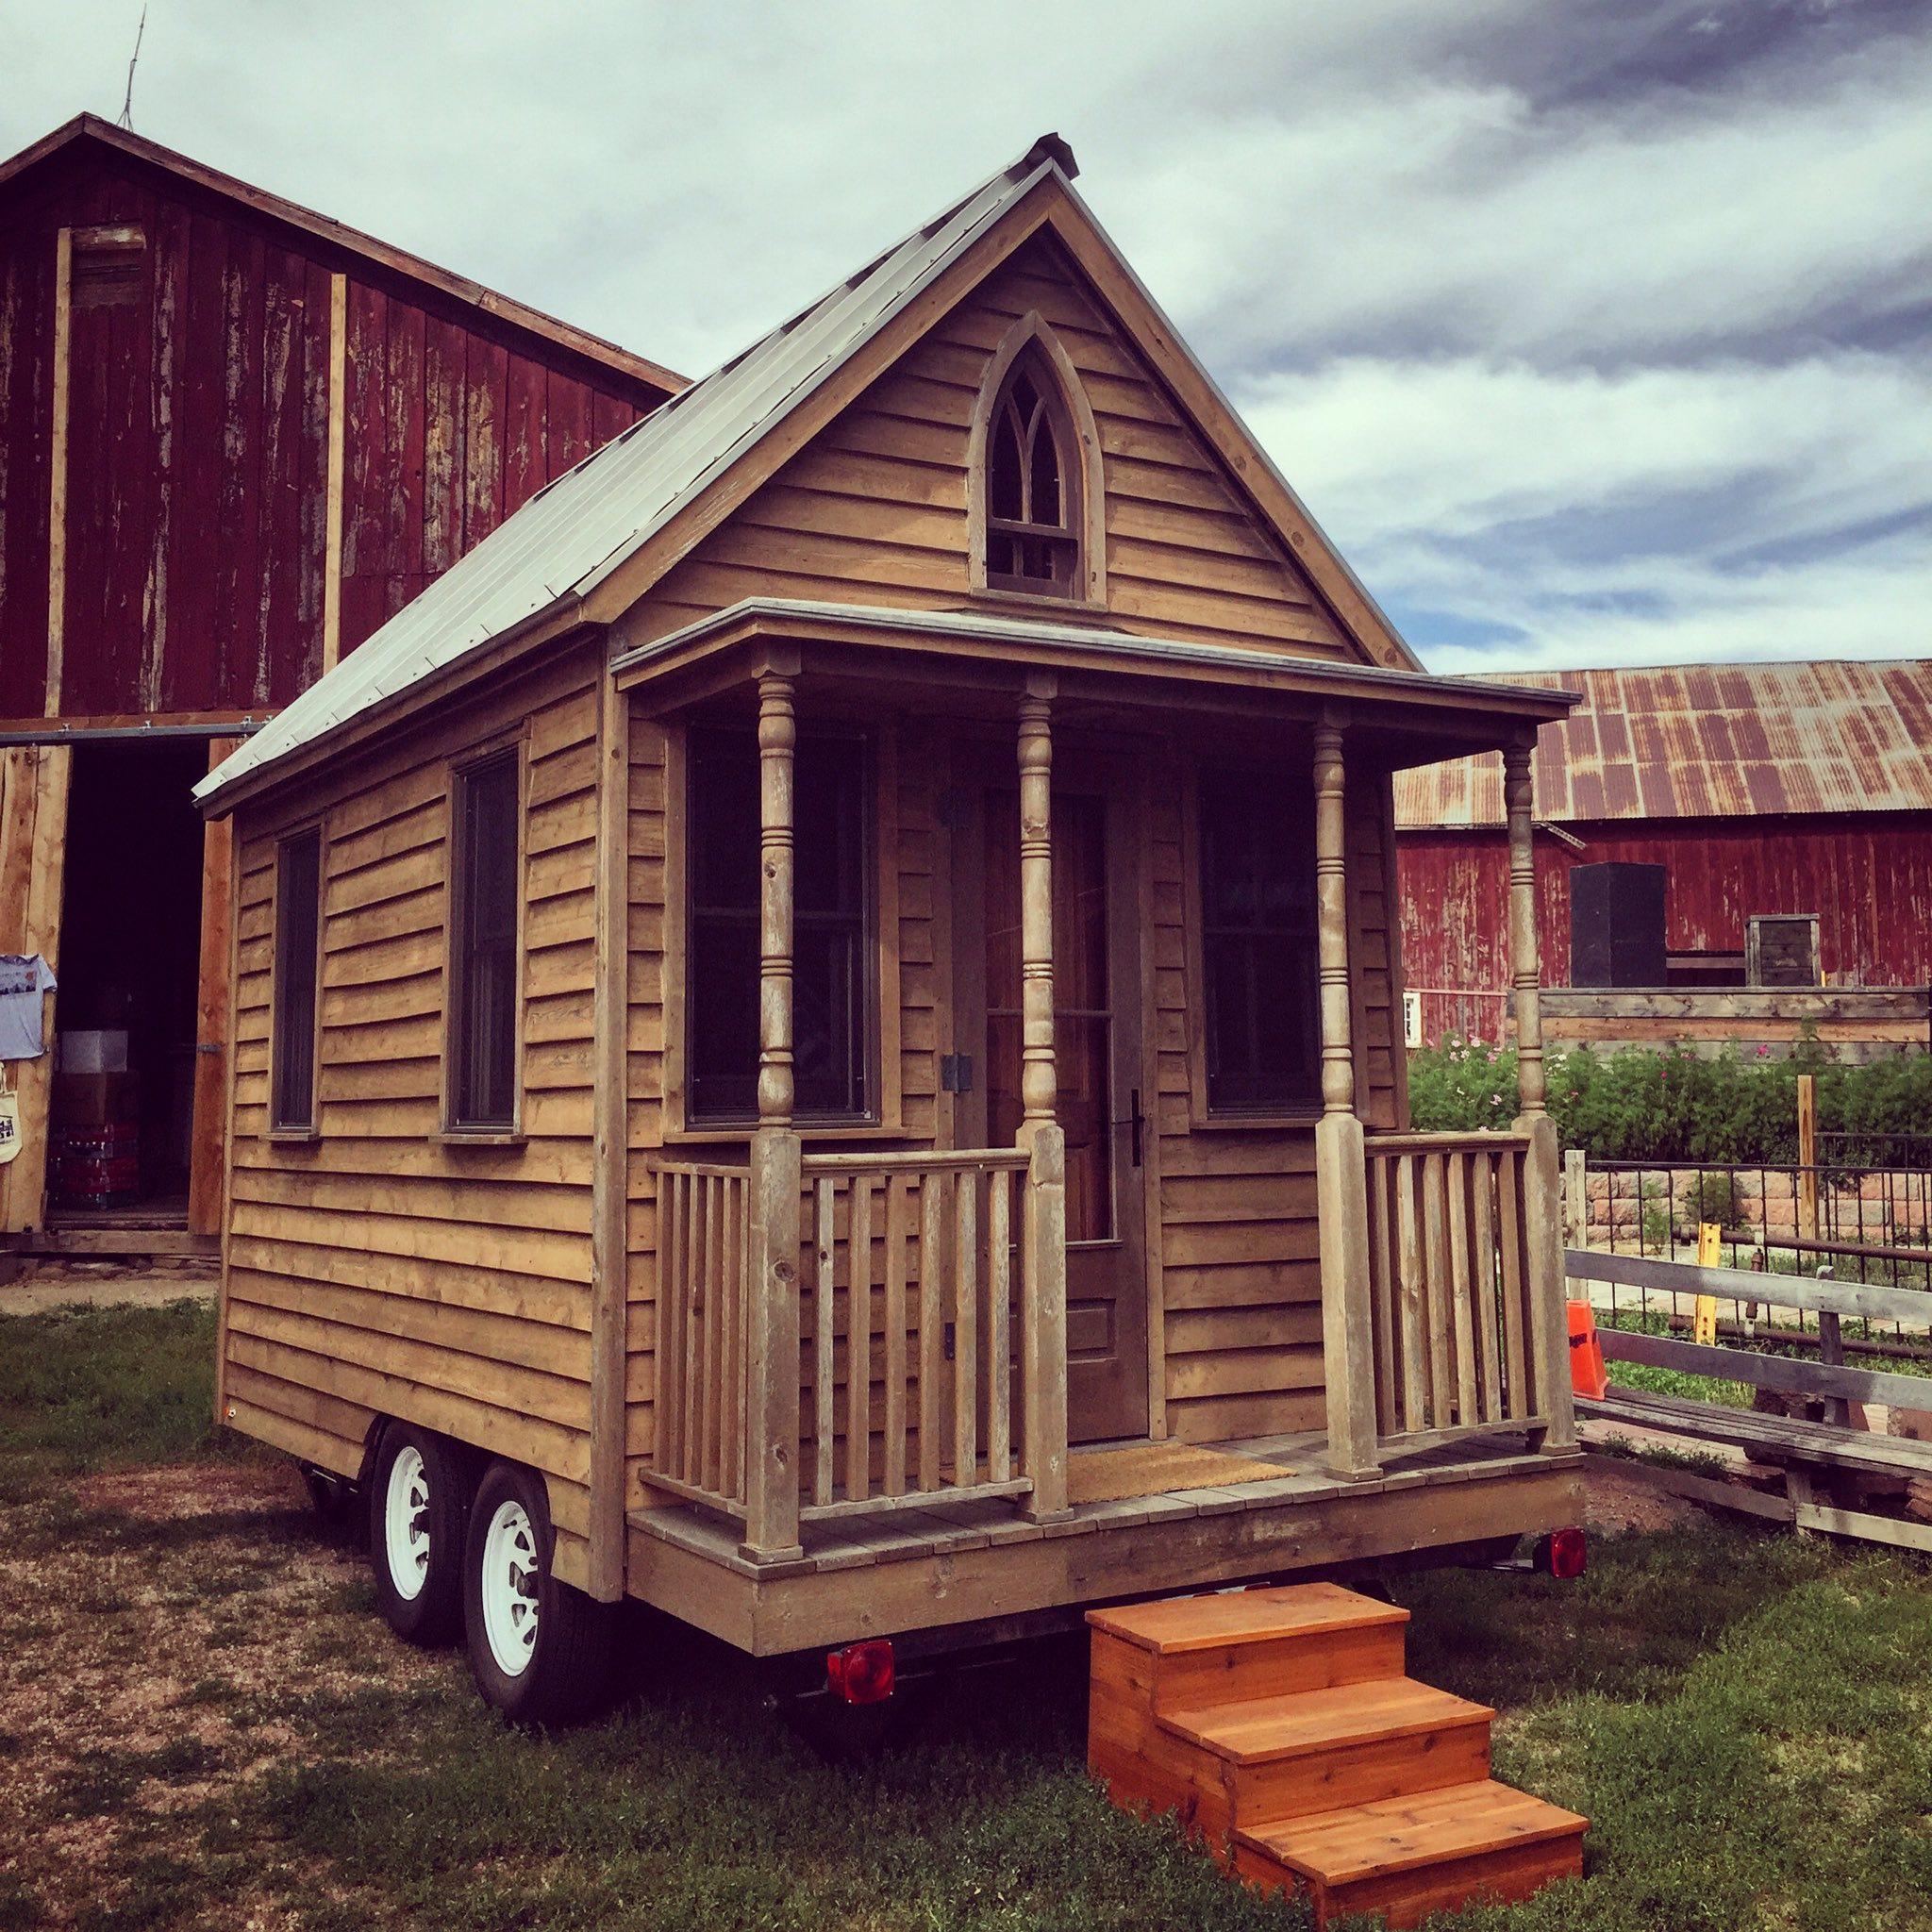 Jay SHafer's original tiny house on wheels